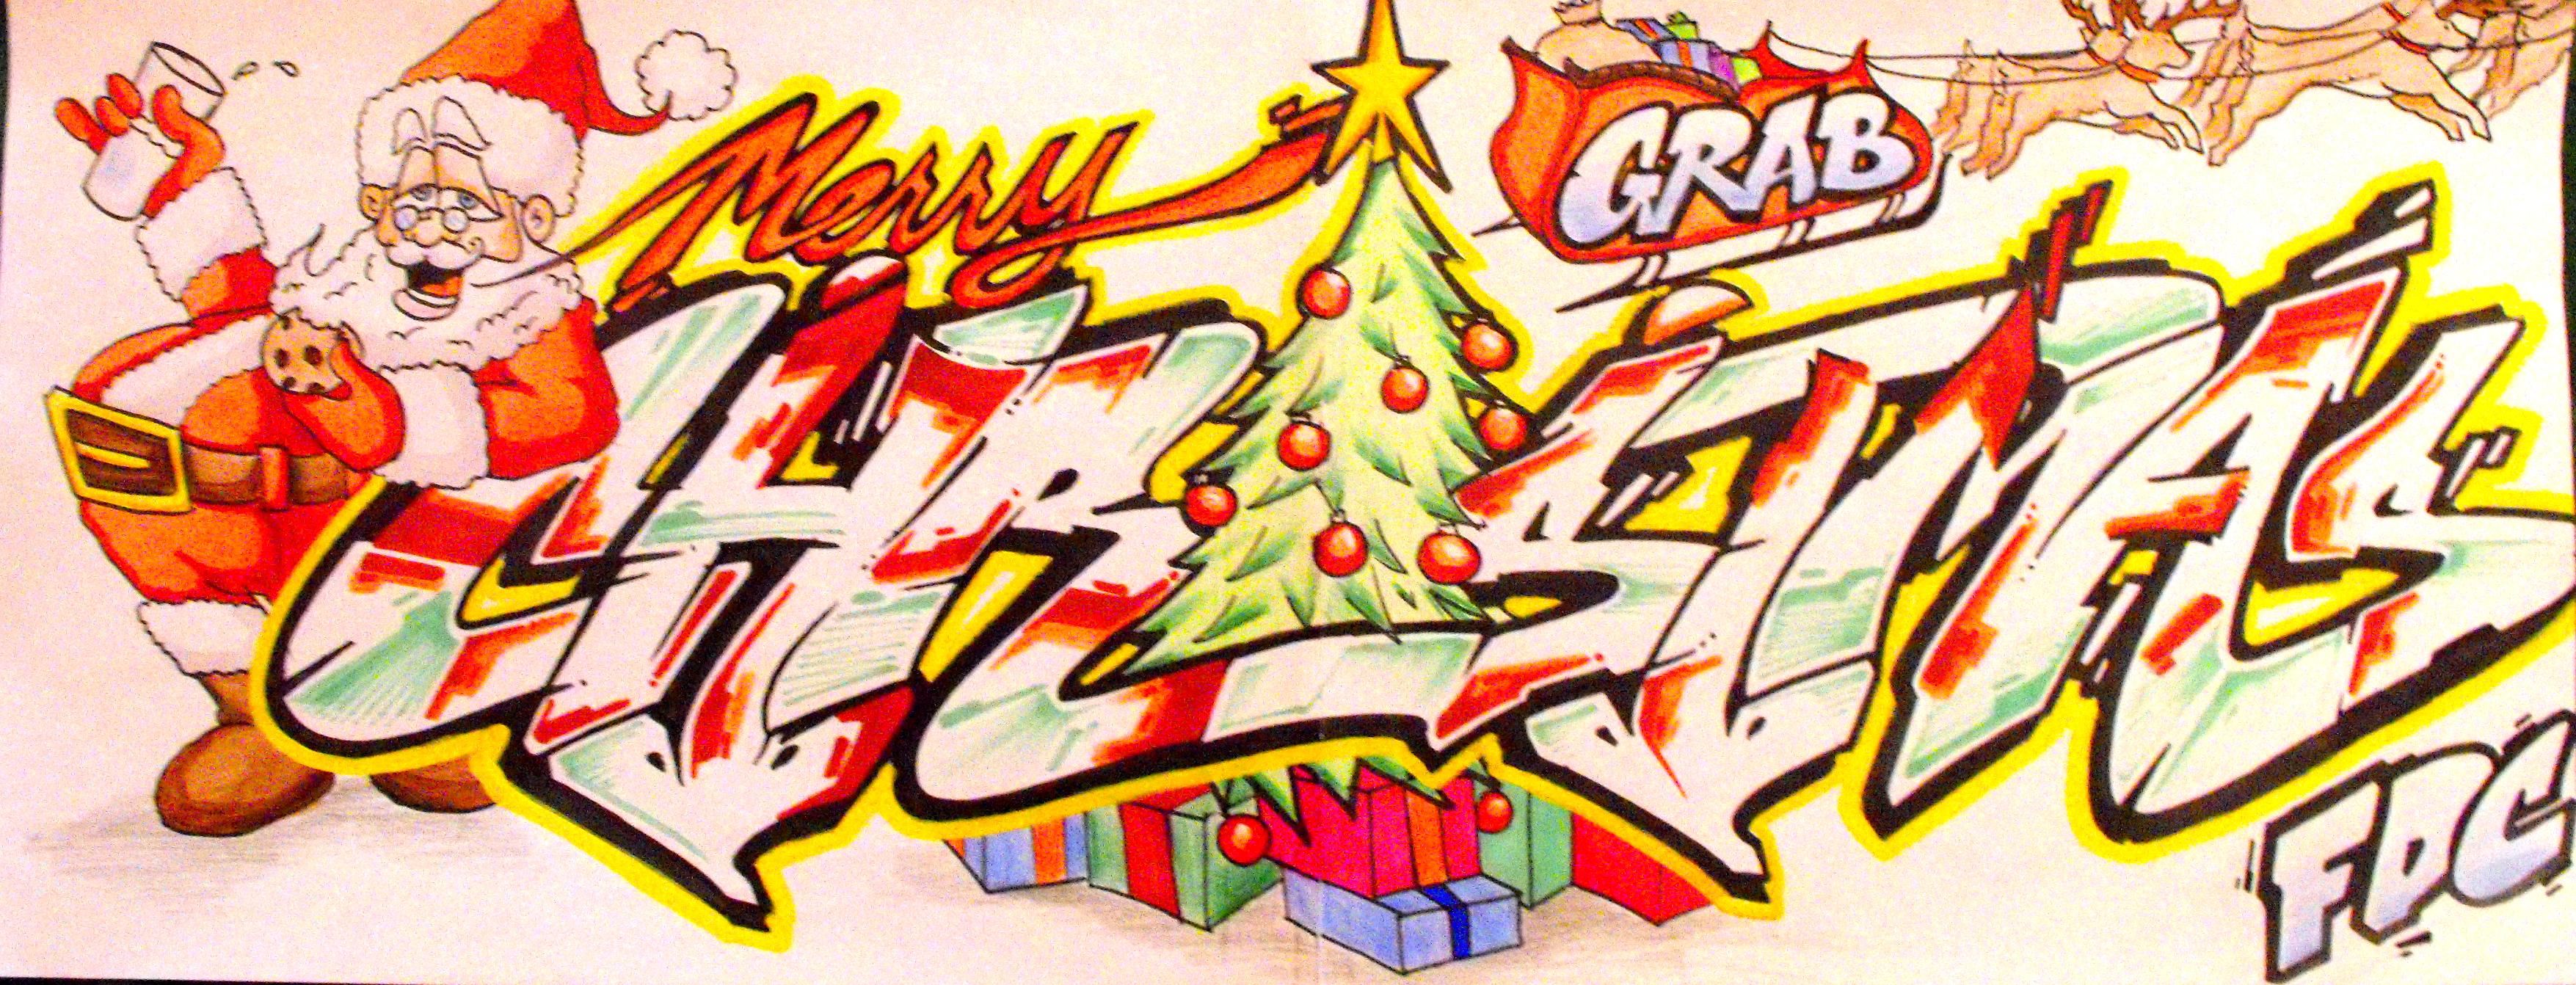 Christmas Graffiti Letters.Merry Christmas Grab Fdcrew Trueelements S Blog